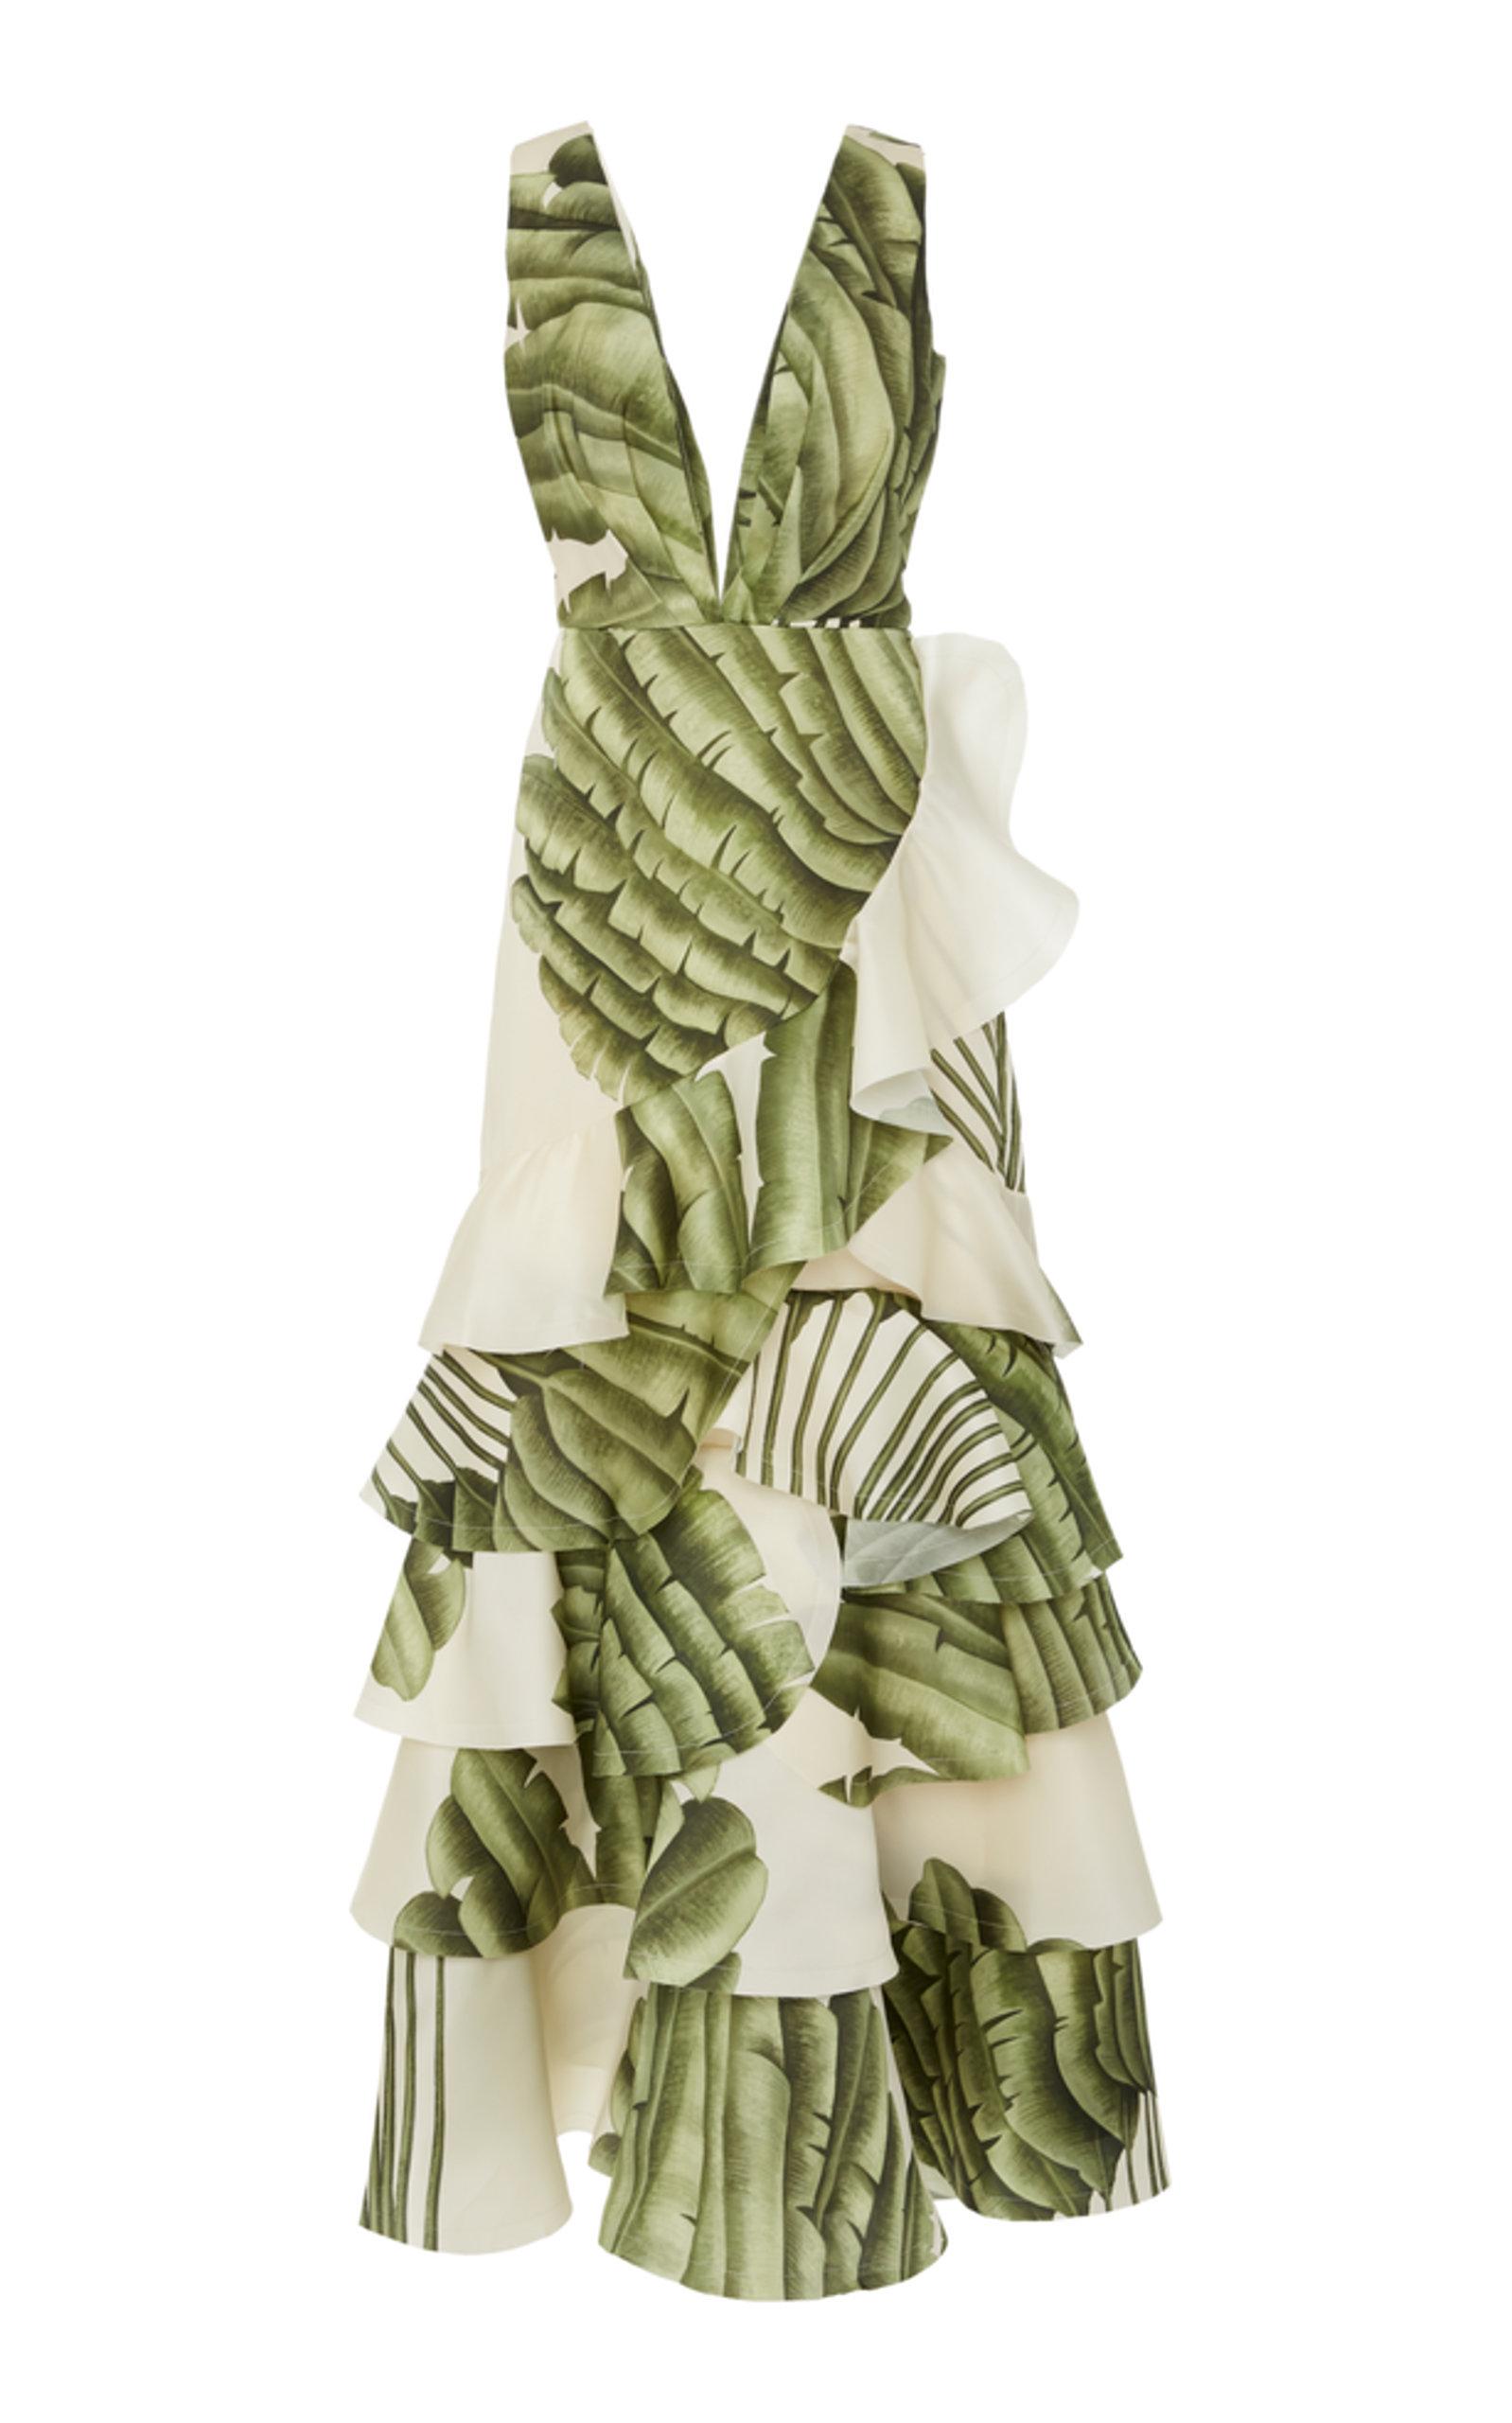 b63b2a2ccd0 Johanna OrtizCoconut Palm Organza Dress. CLOSE. Loading